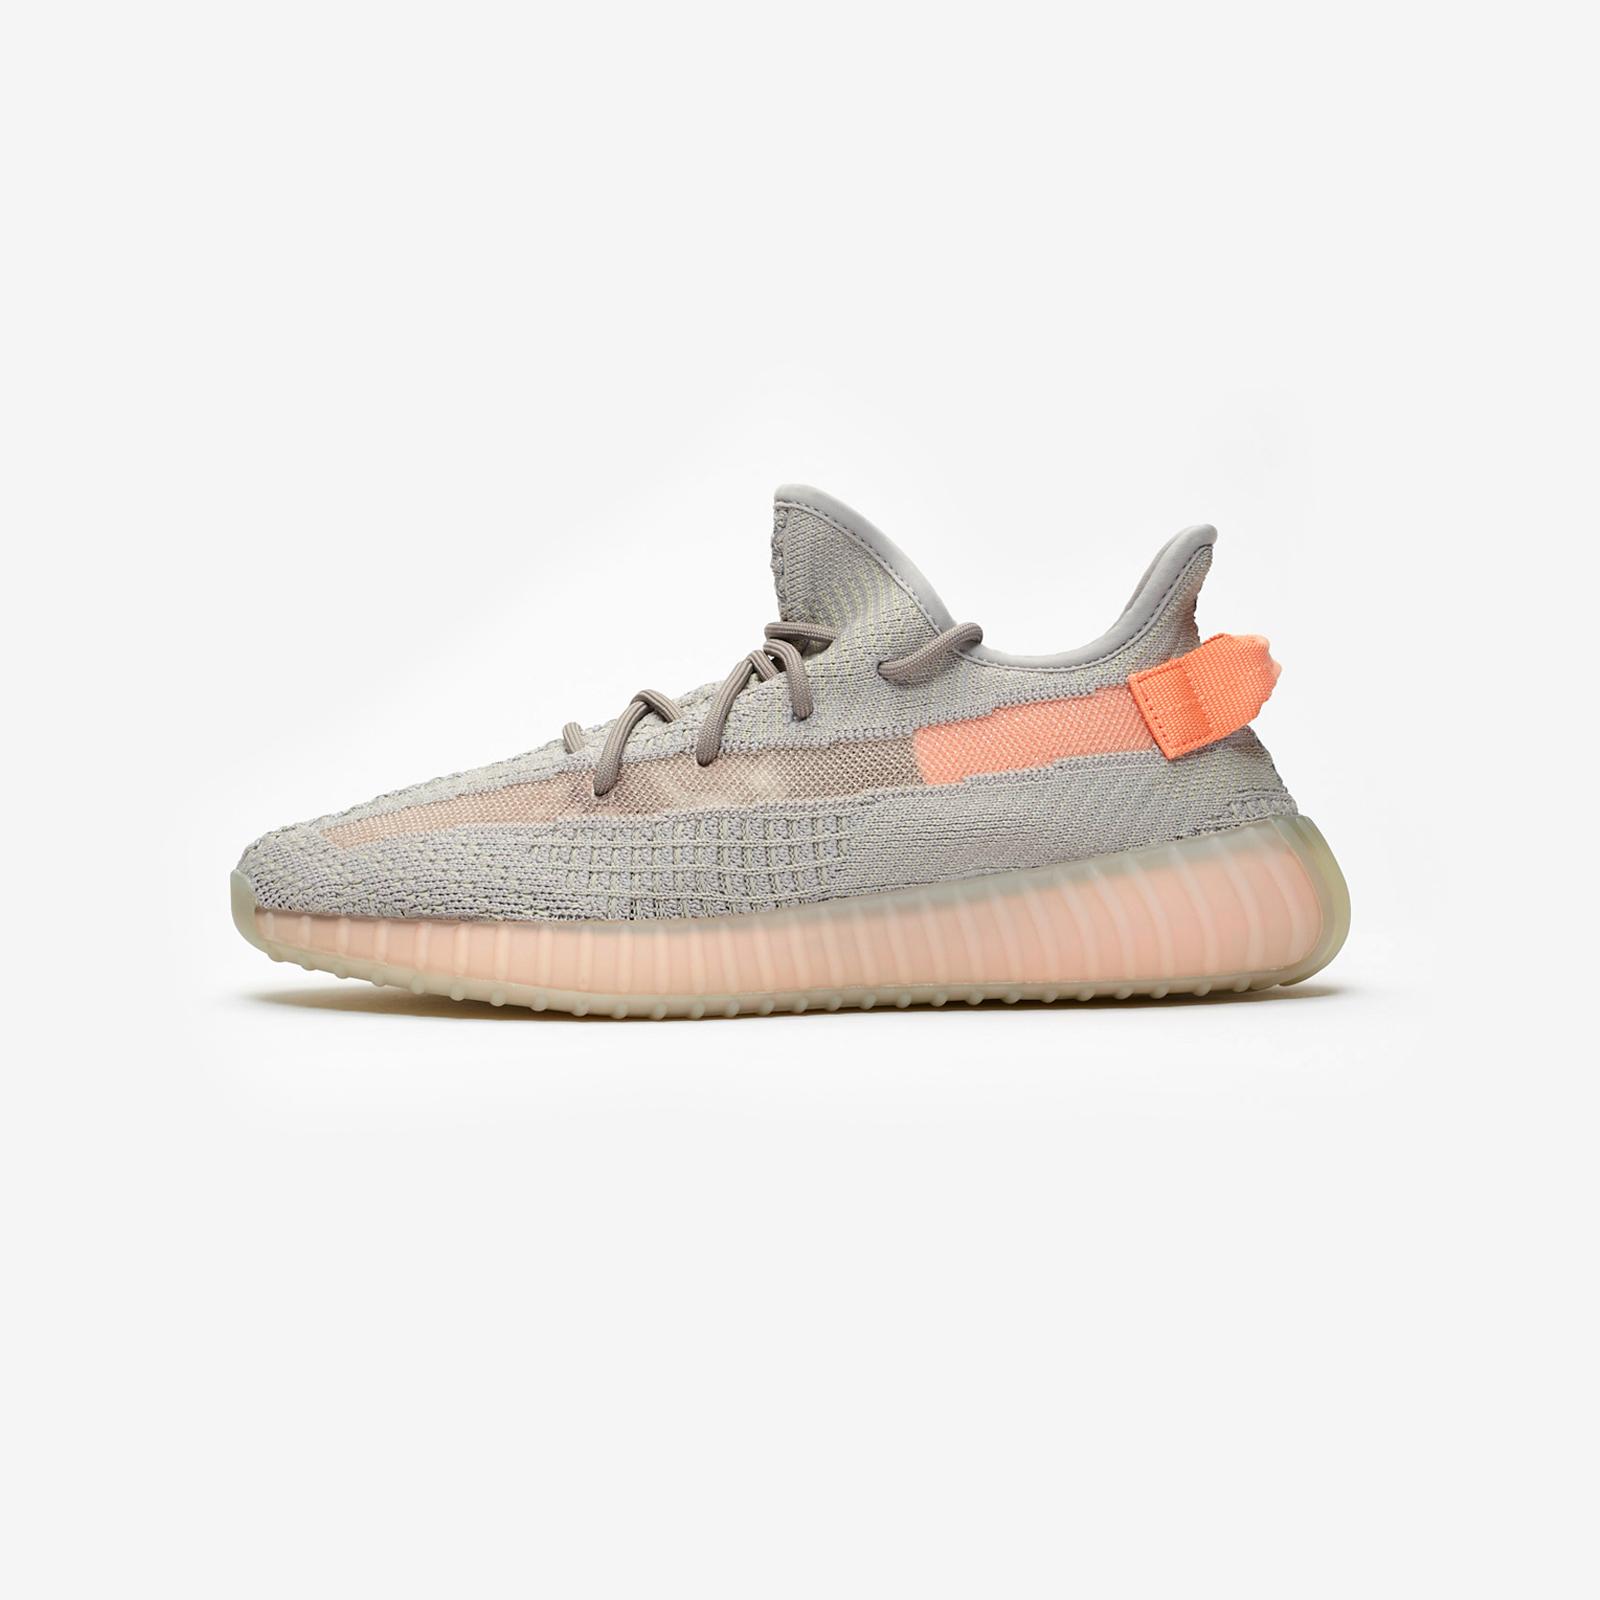 224e34b21739a adidas Yeezy Boost 350 V2 - Eg7492 - Sneakersnstuff